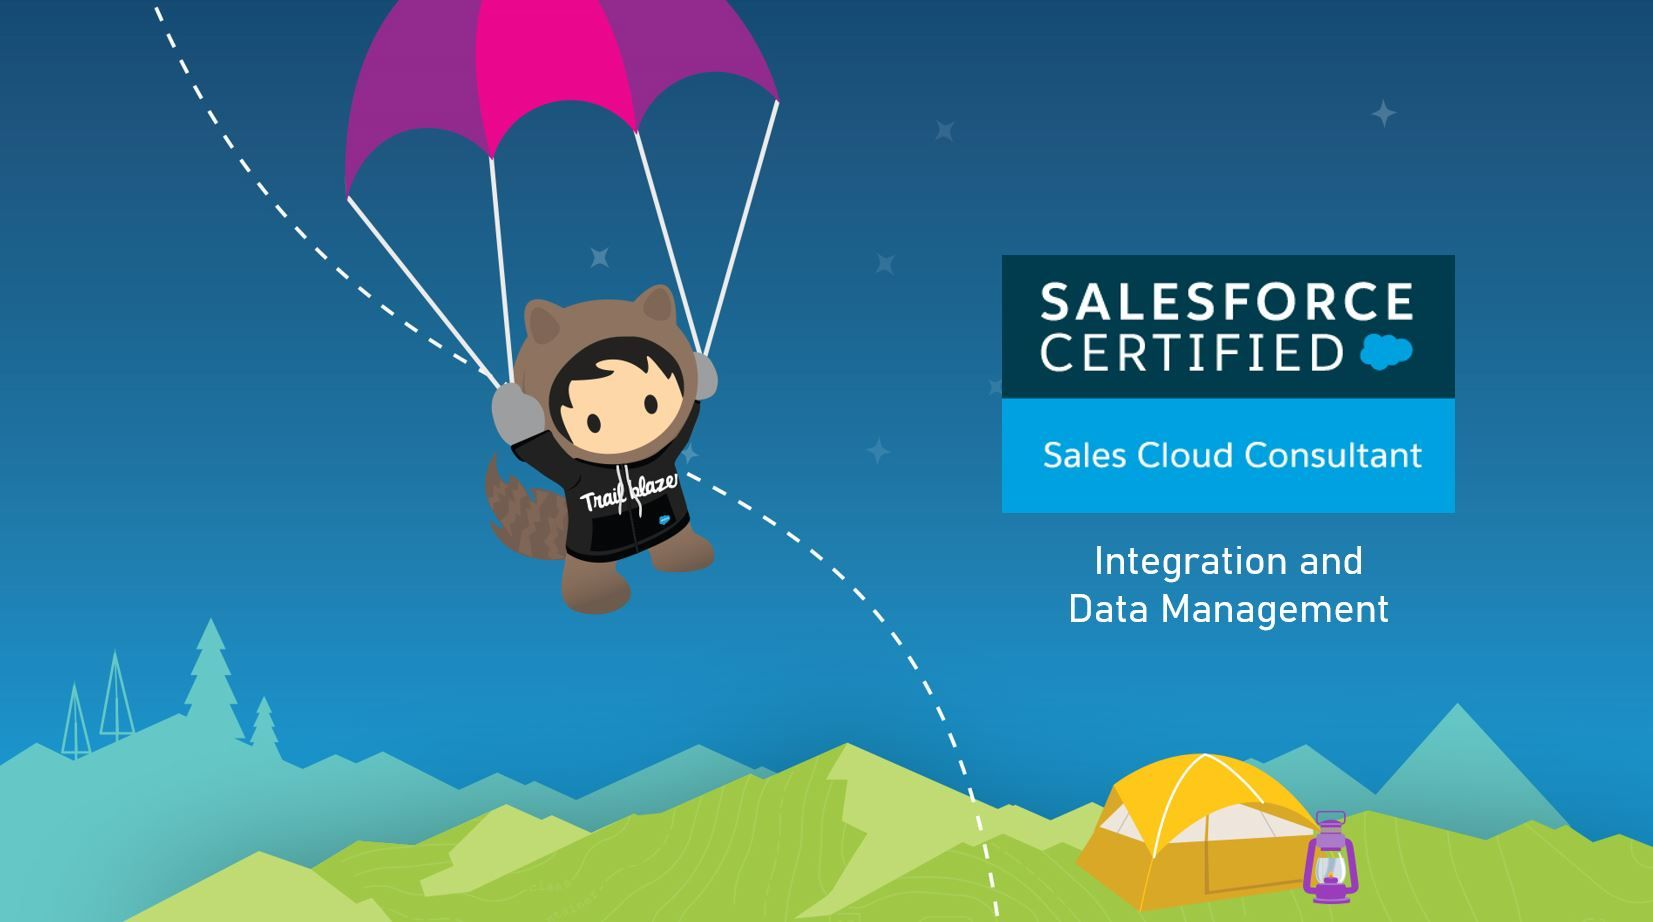 Salesforce Sales Cloud Consultant Exam Preparation: Integration and Data Management